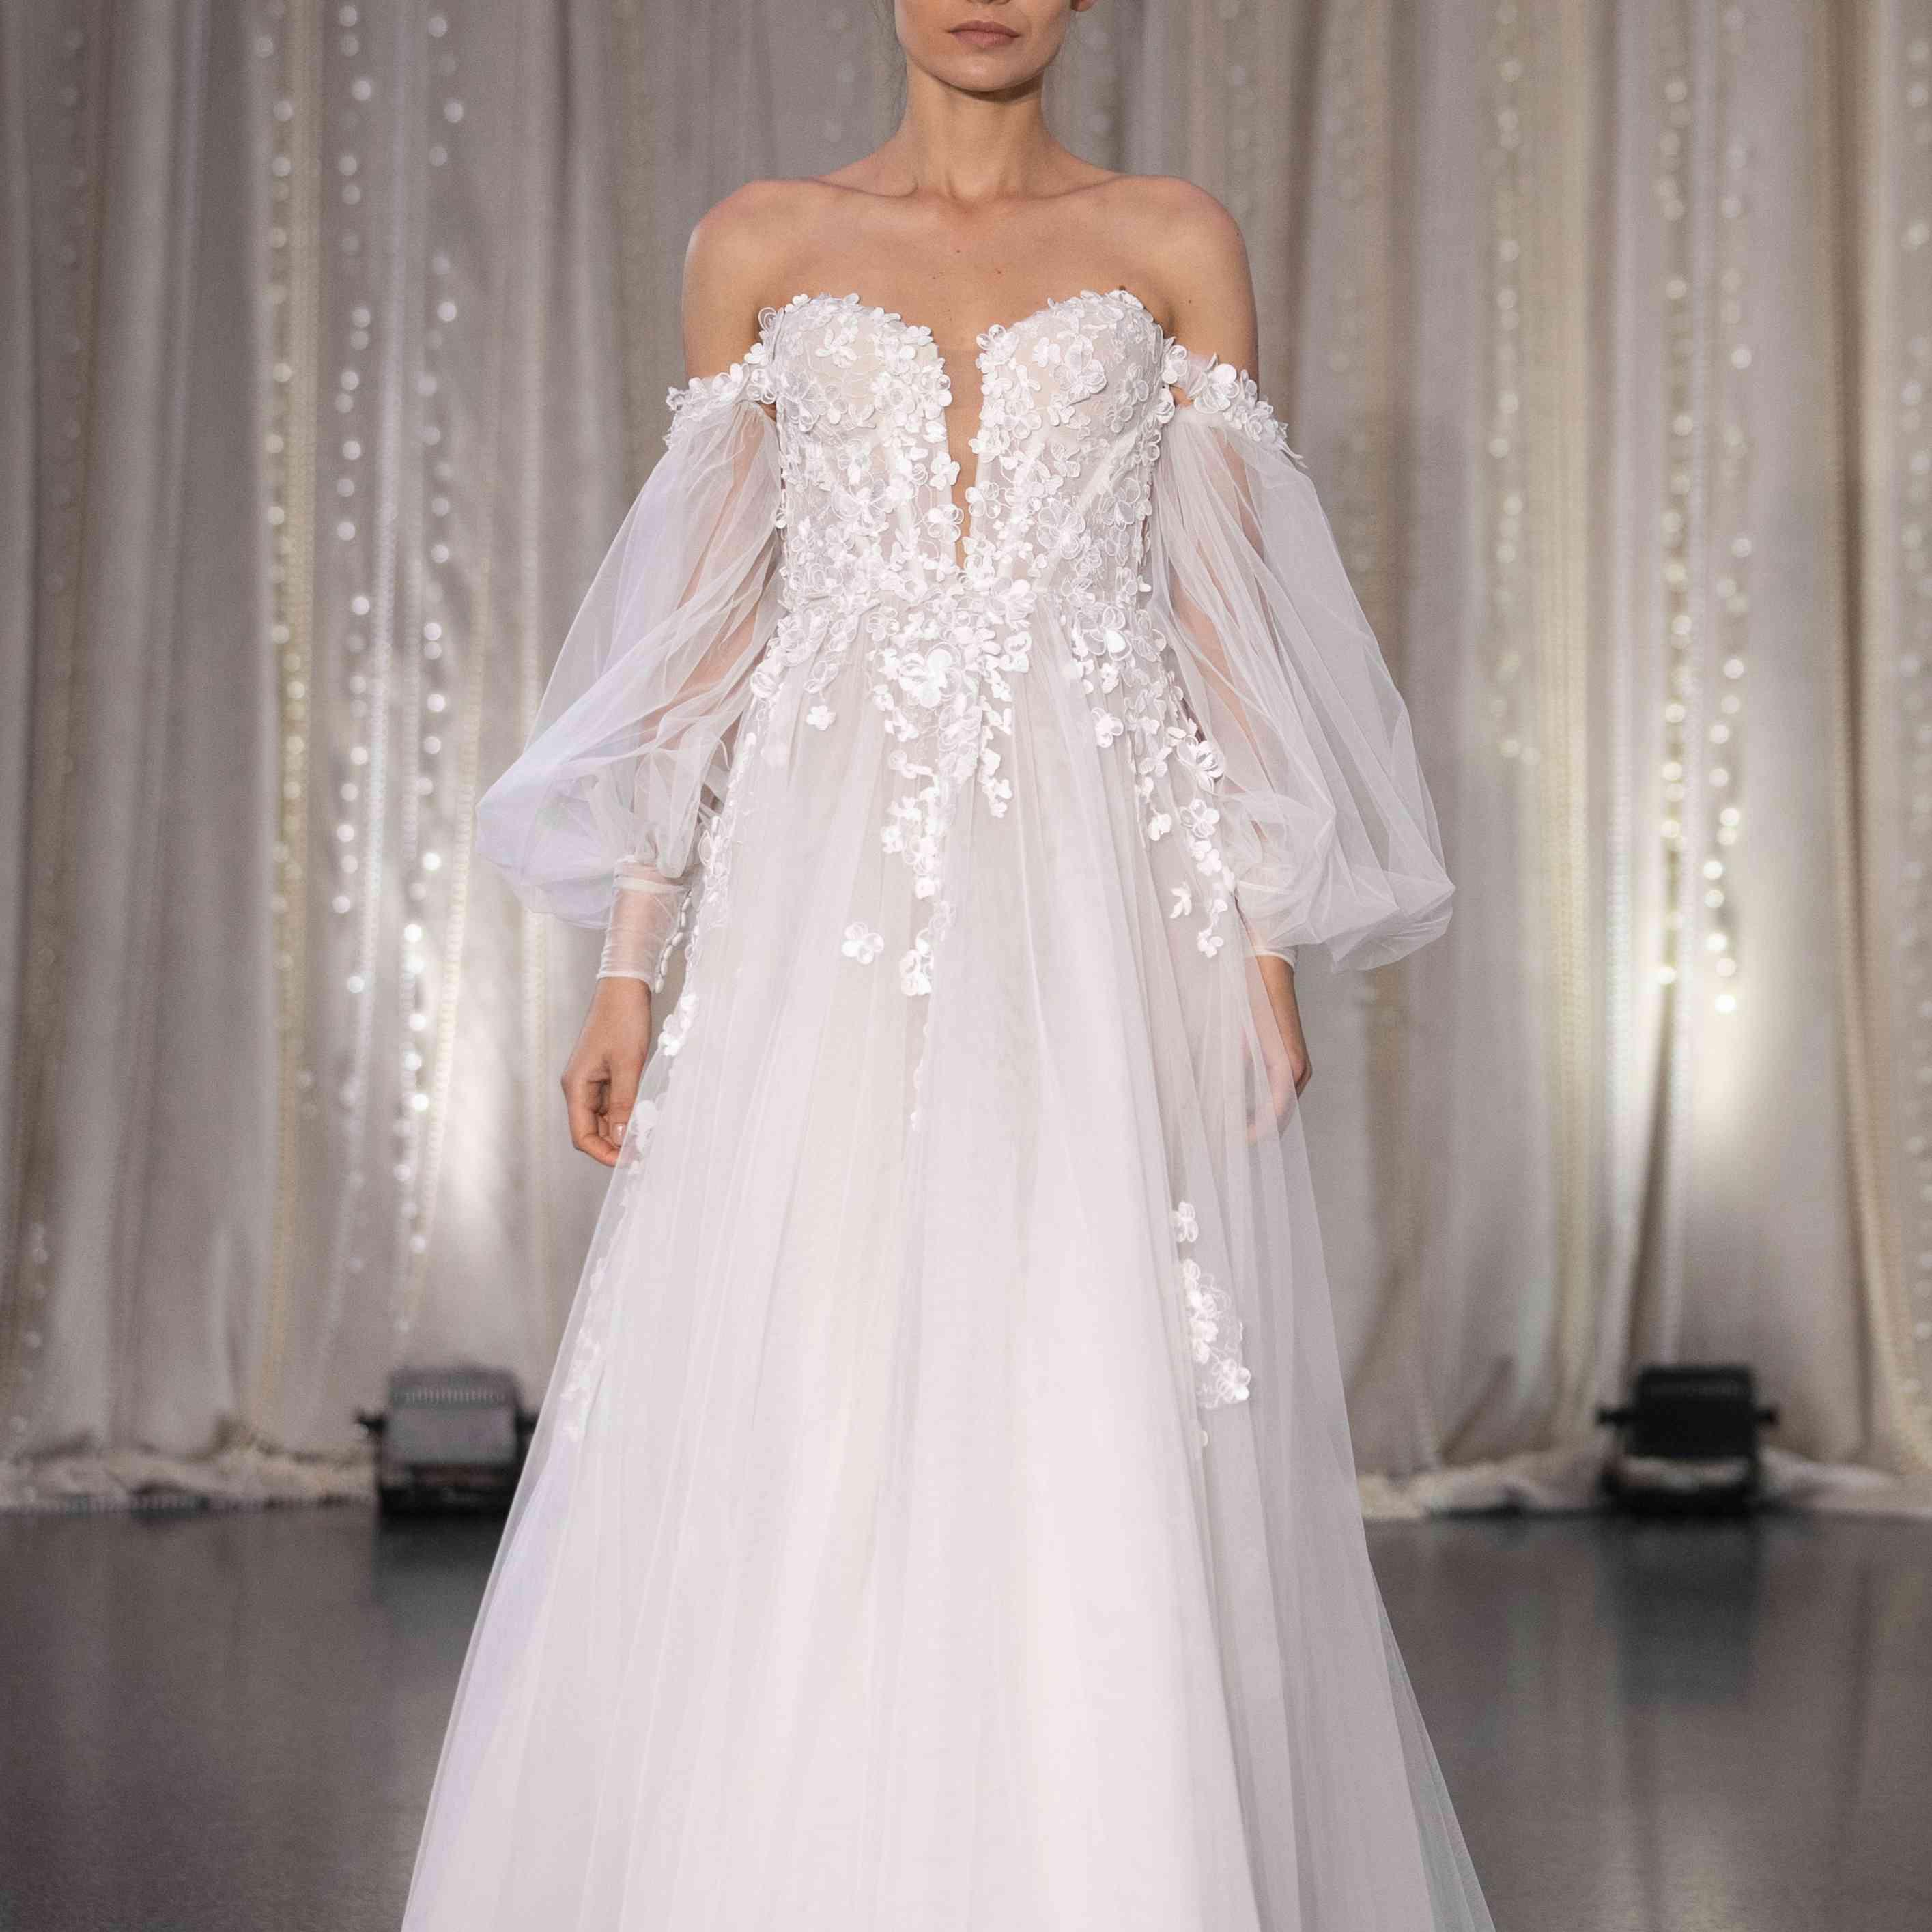 Model in off-the-shoulder tulle A-line wedding dress